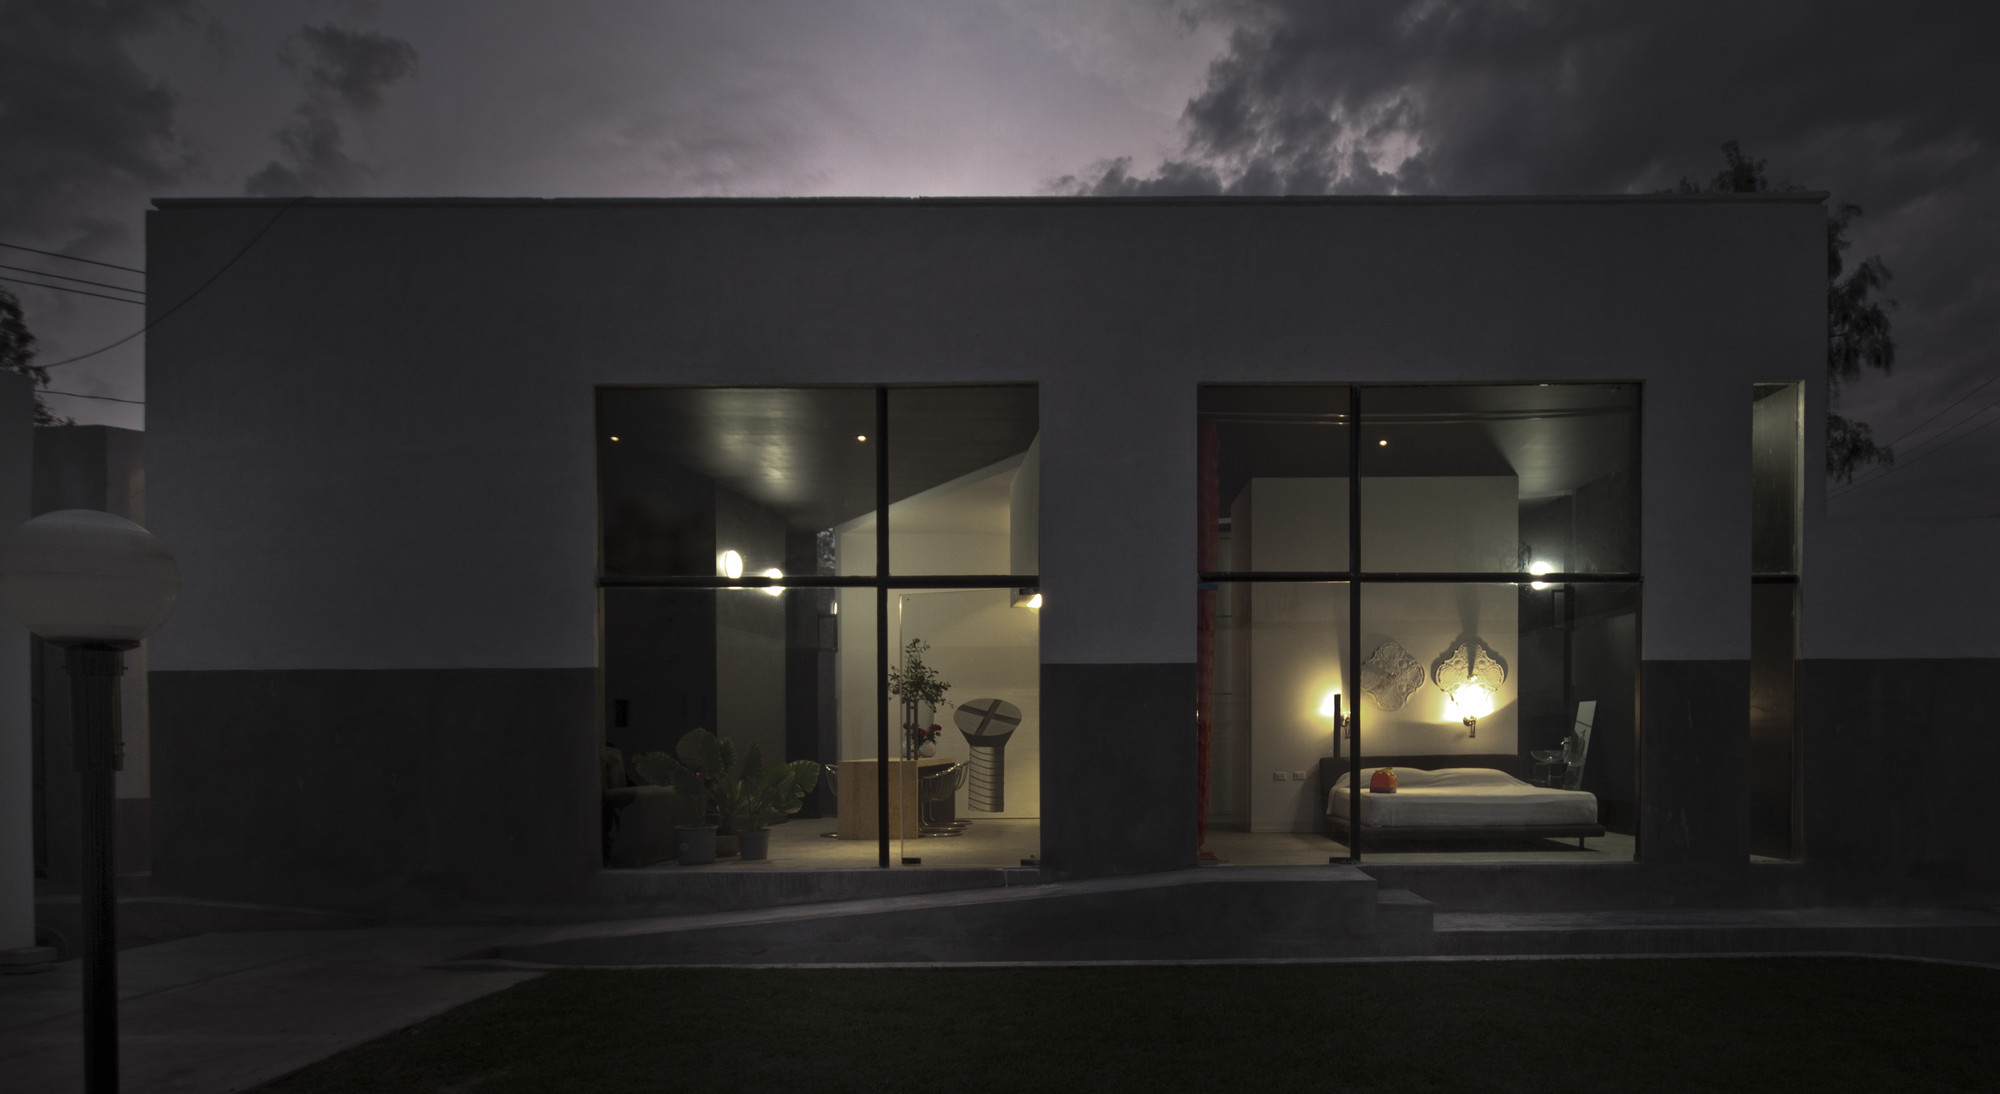 Great-Grand Parents House / Jesus Davila Architects, © Eddy Yuvoniel